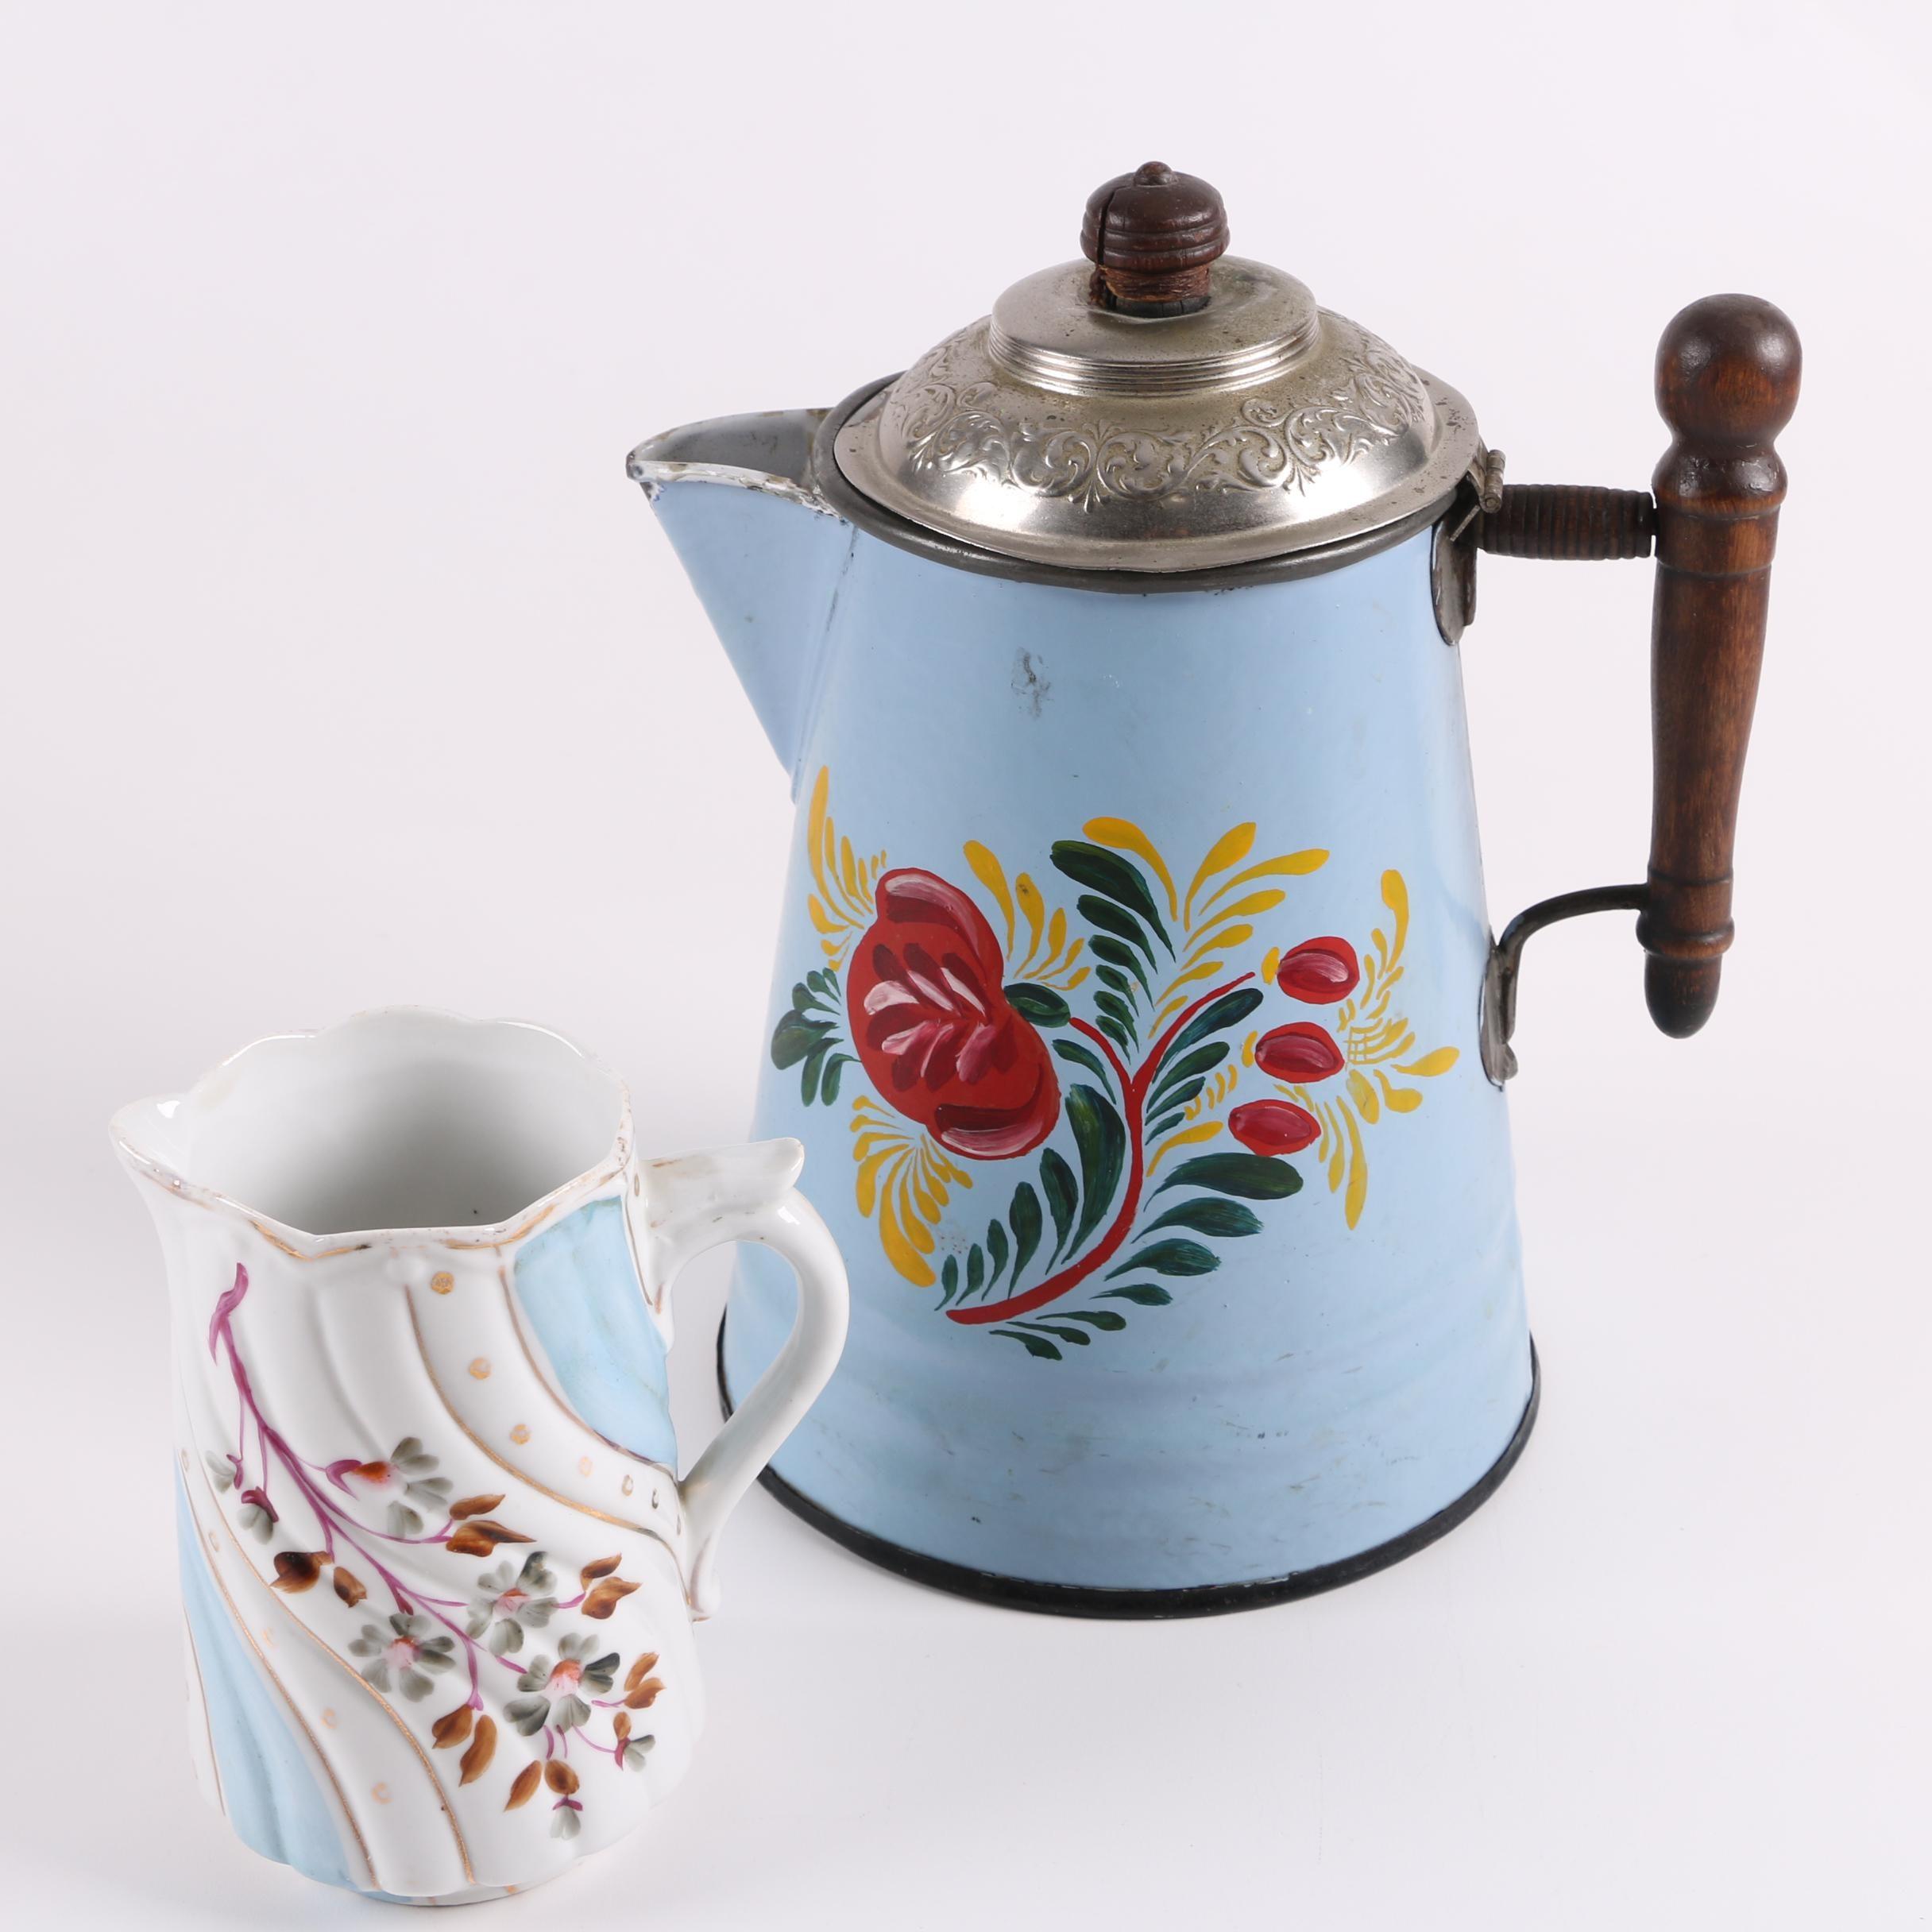 Vintage Enameled Coffee Pot and German Porcelain Jug